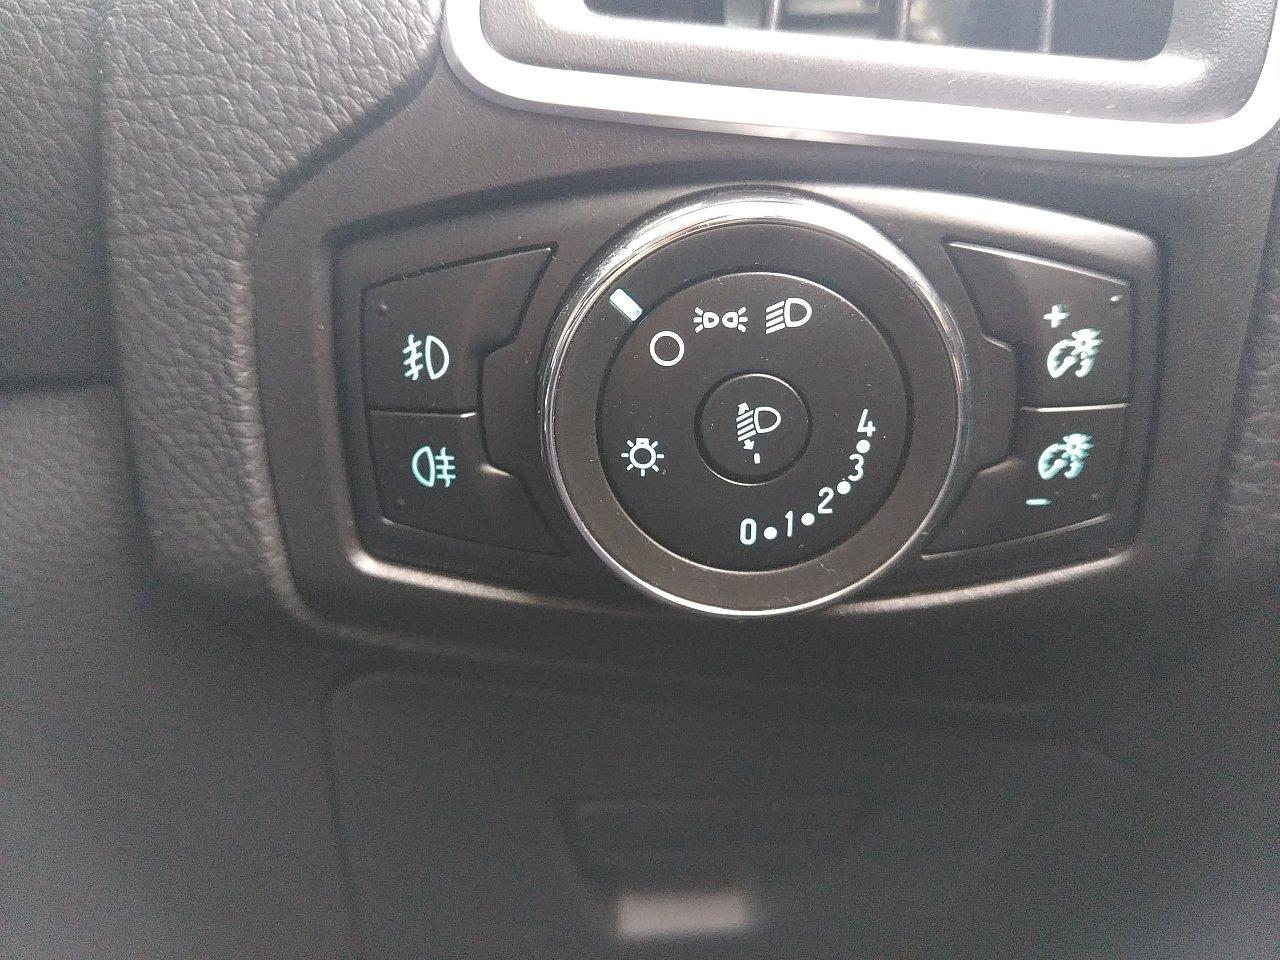 Ford Focus 2.0 TDCi 163 Zetec S 5dr Powershift image 20